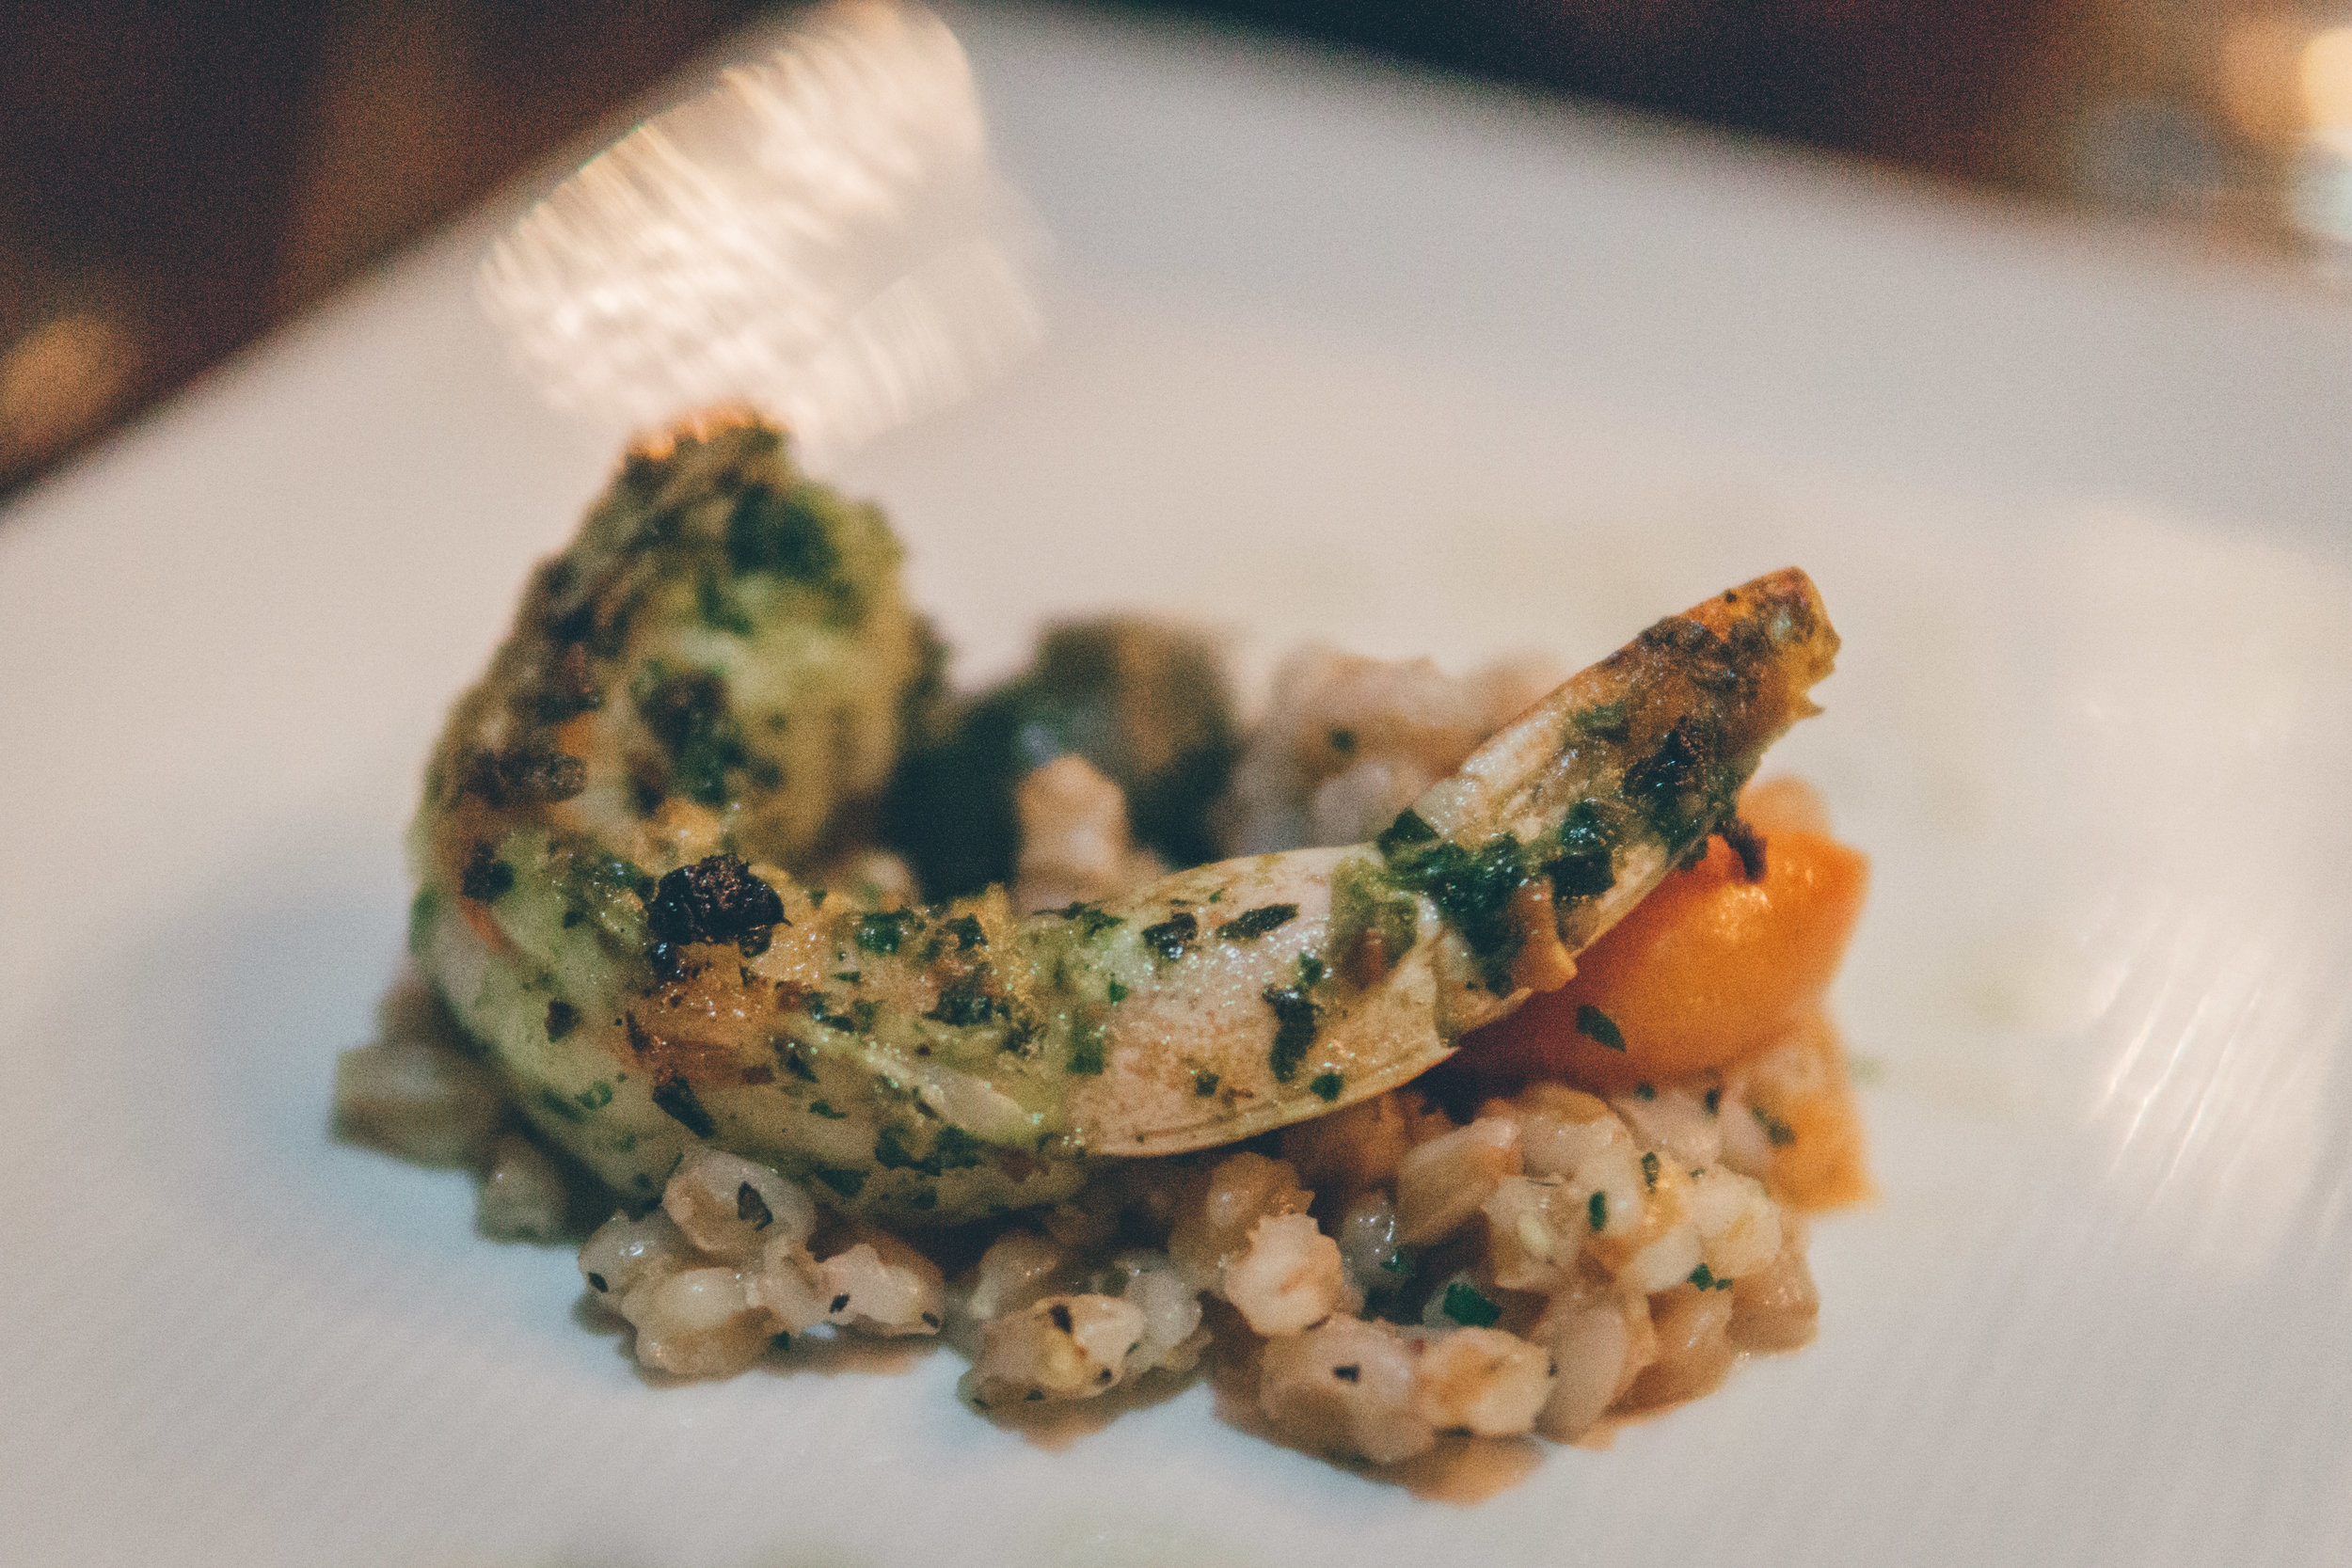 Shrimp & Grains: Pistachio Pesto, Warm Farro Salad, Baby Tomatoes & Sicilian Olives